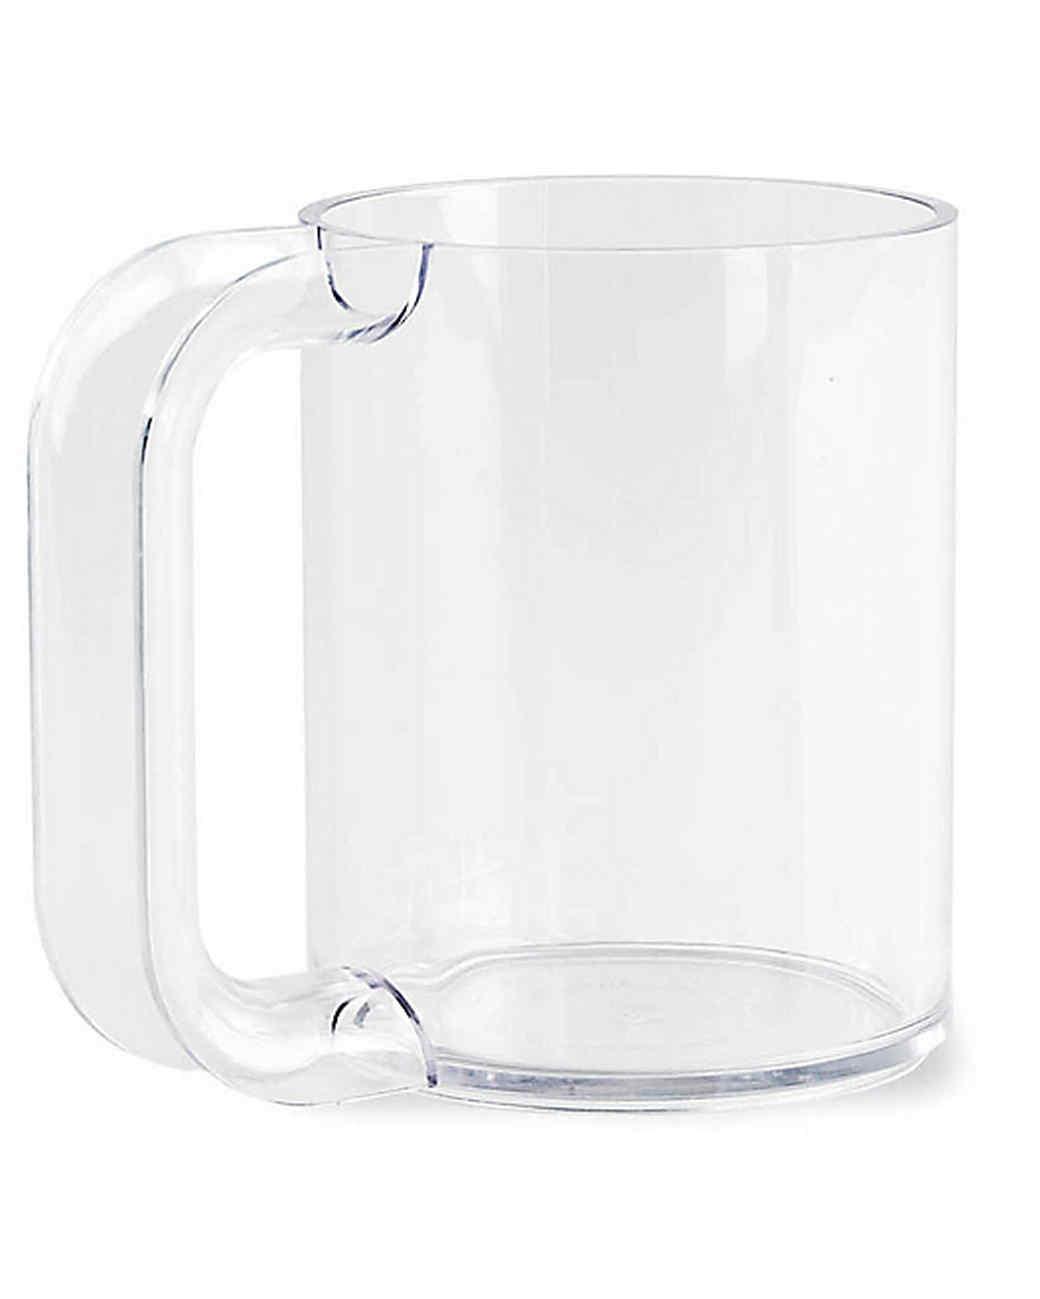 3-lucite-dwr-mug.jpg